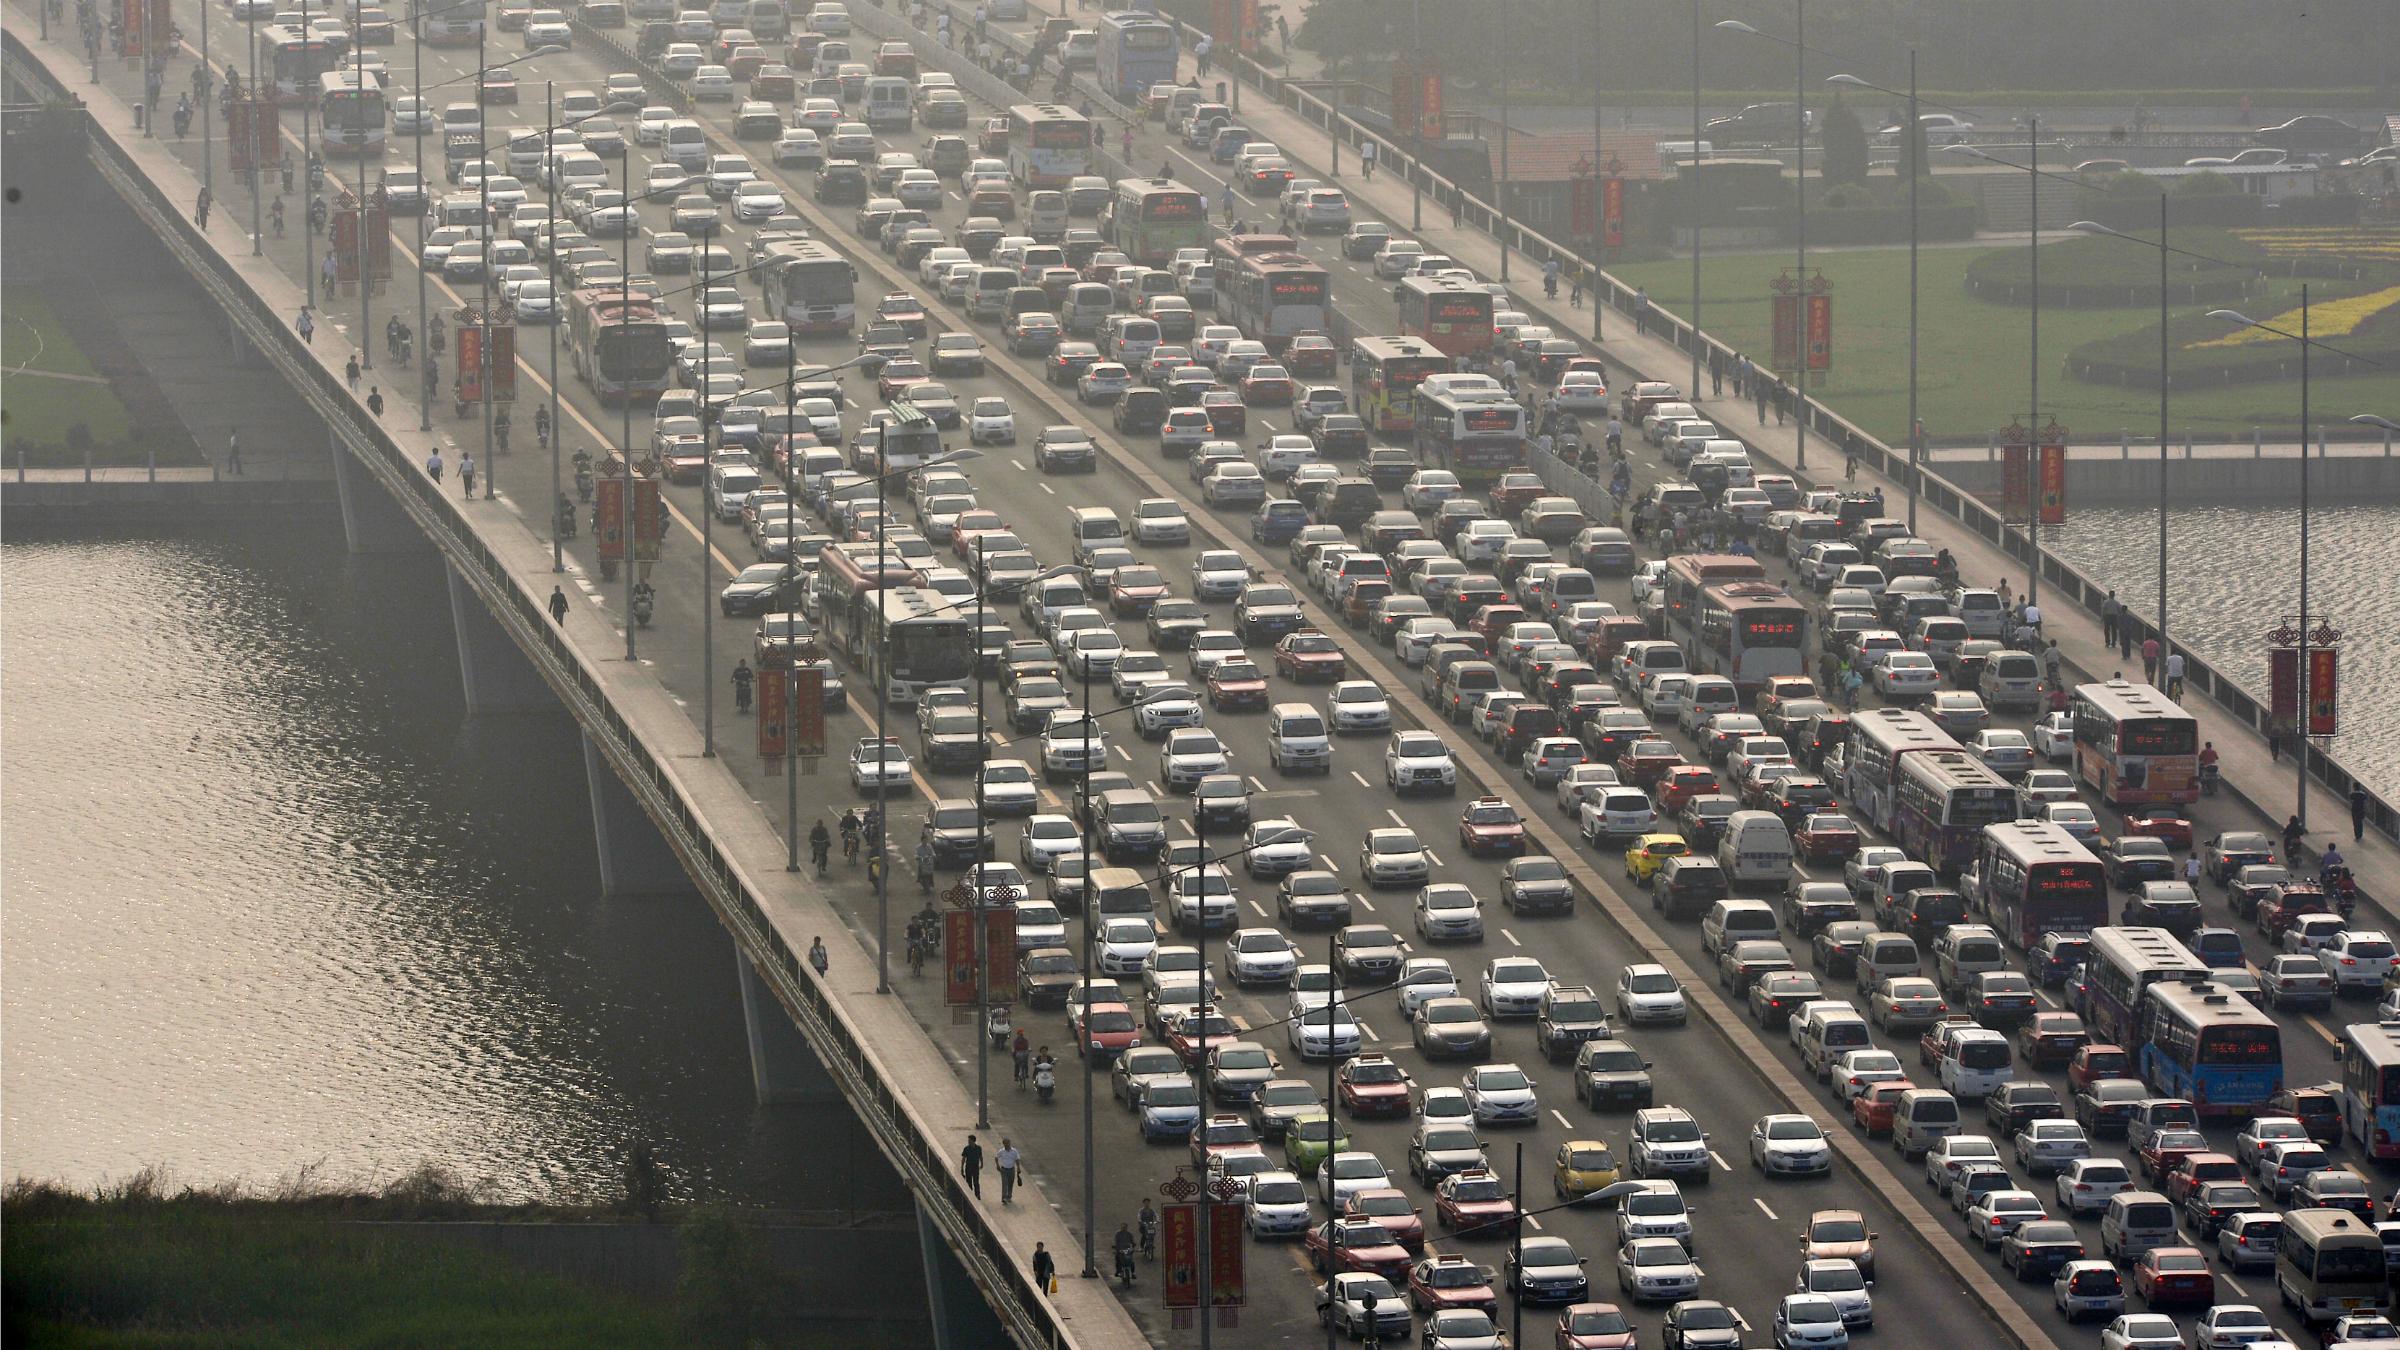 City car traffic